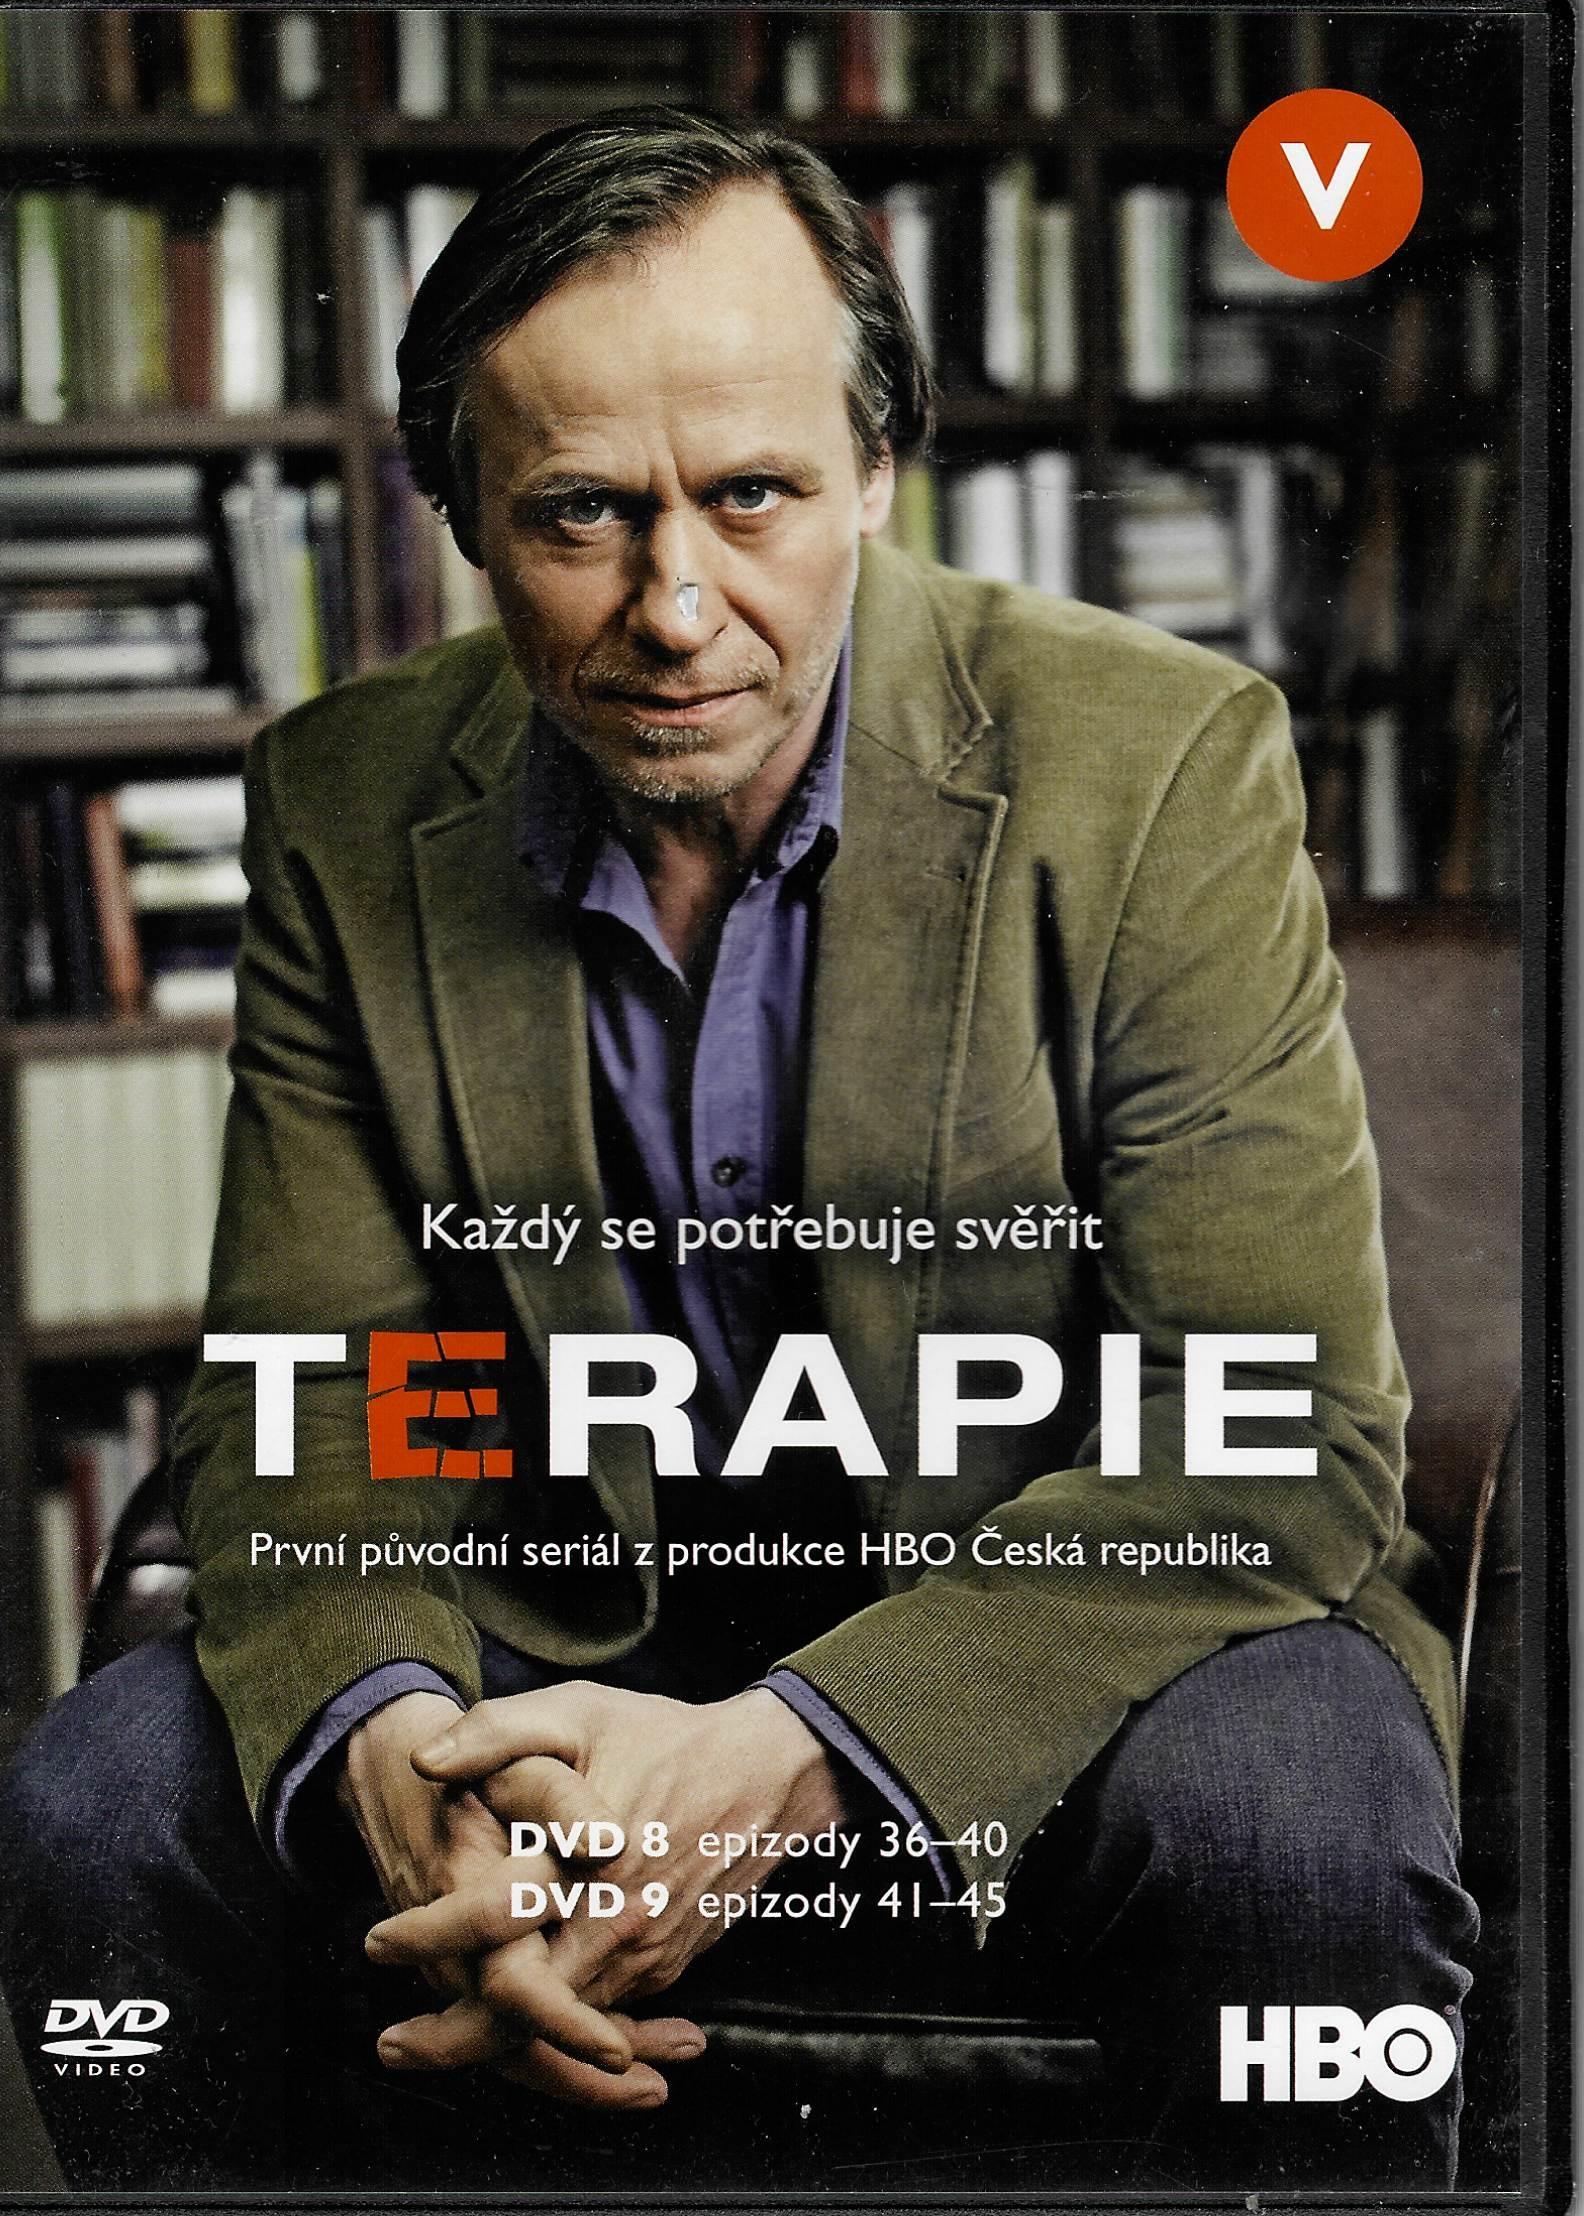 Terapie 1. série – (disk 8. - 9.) -  2 DVD plast